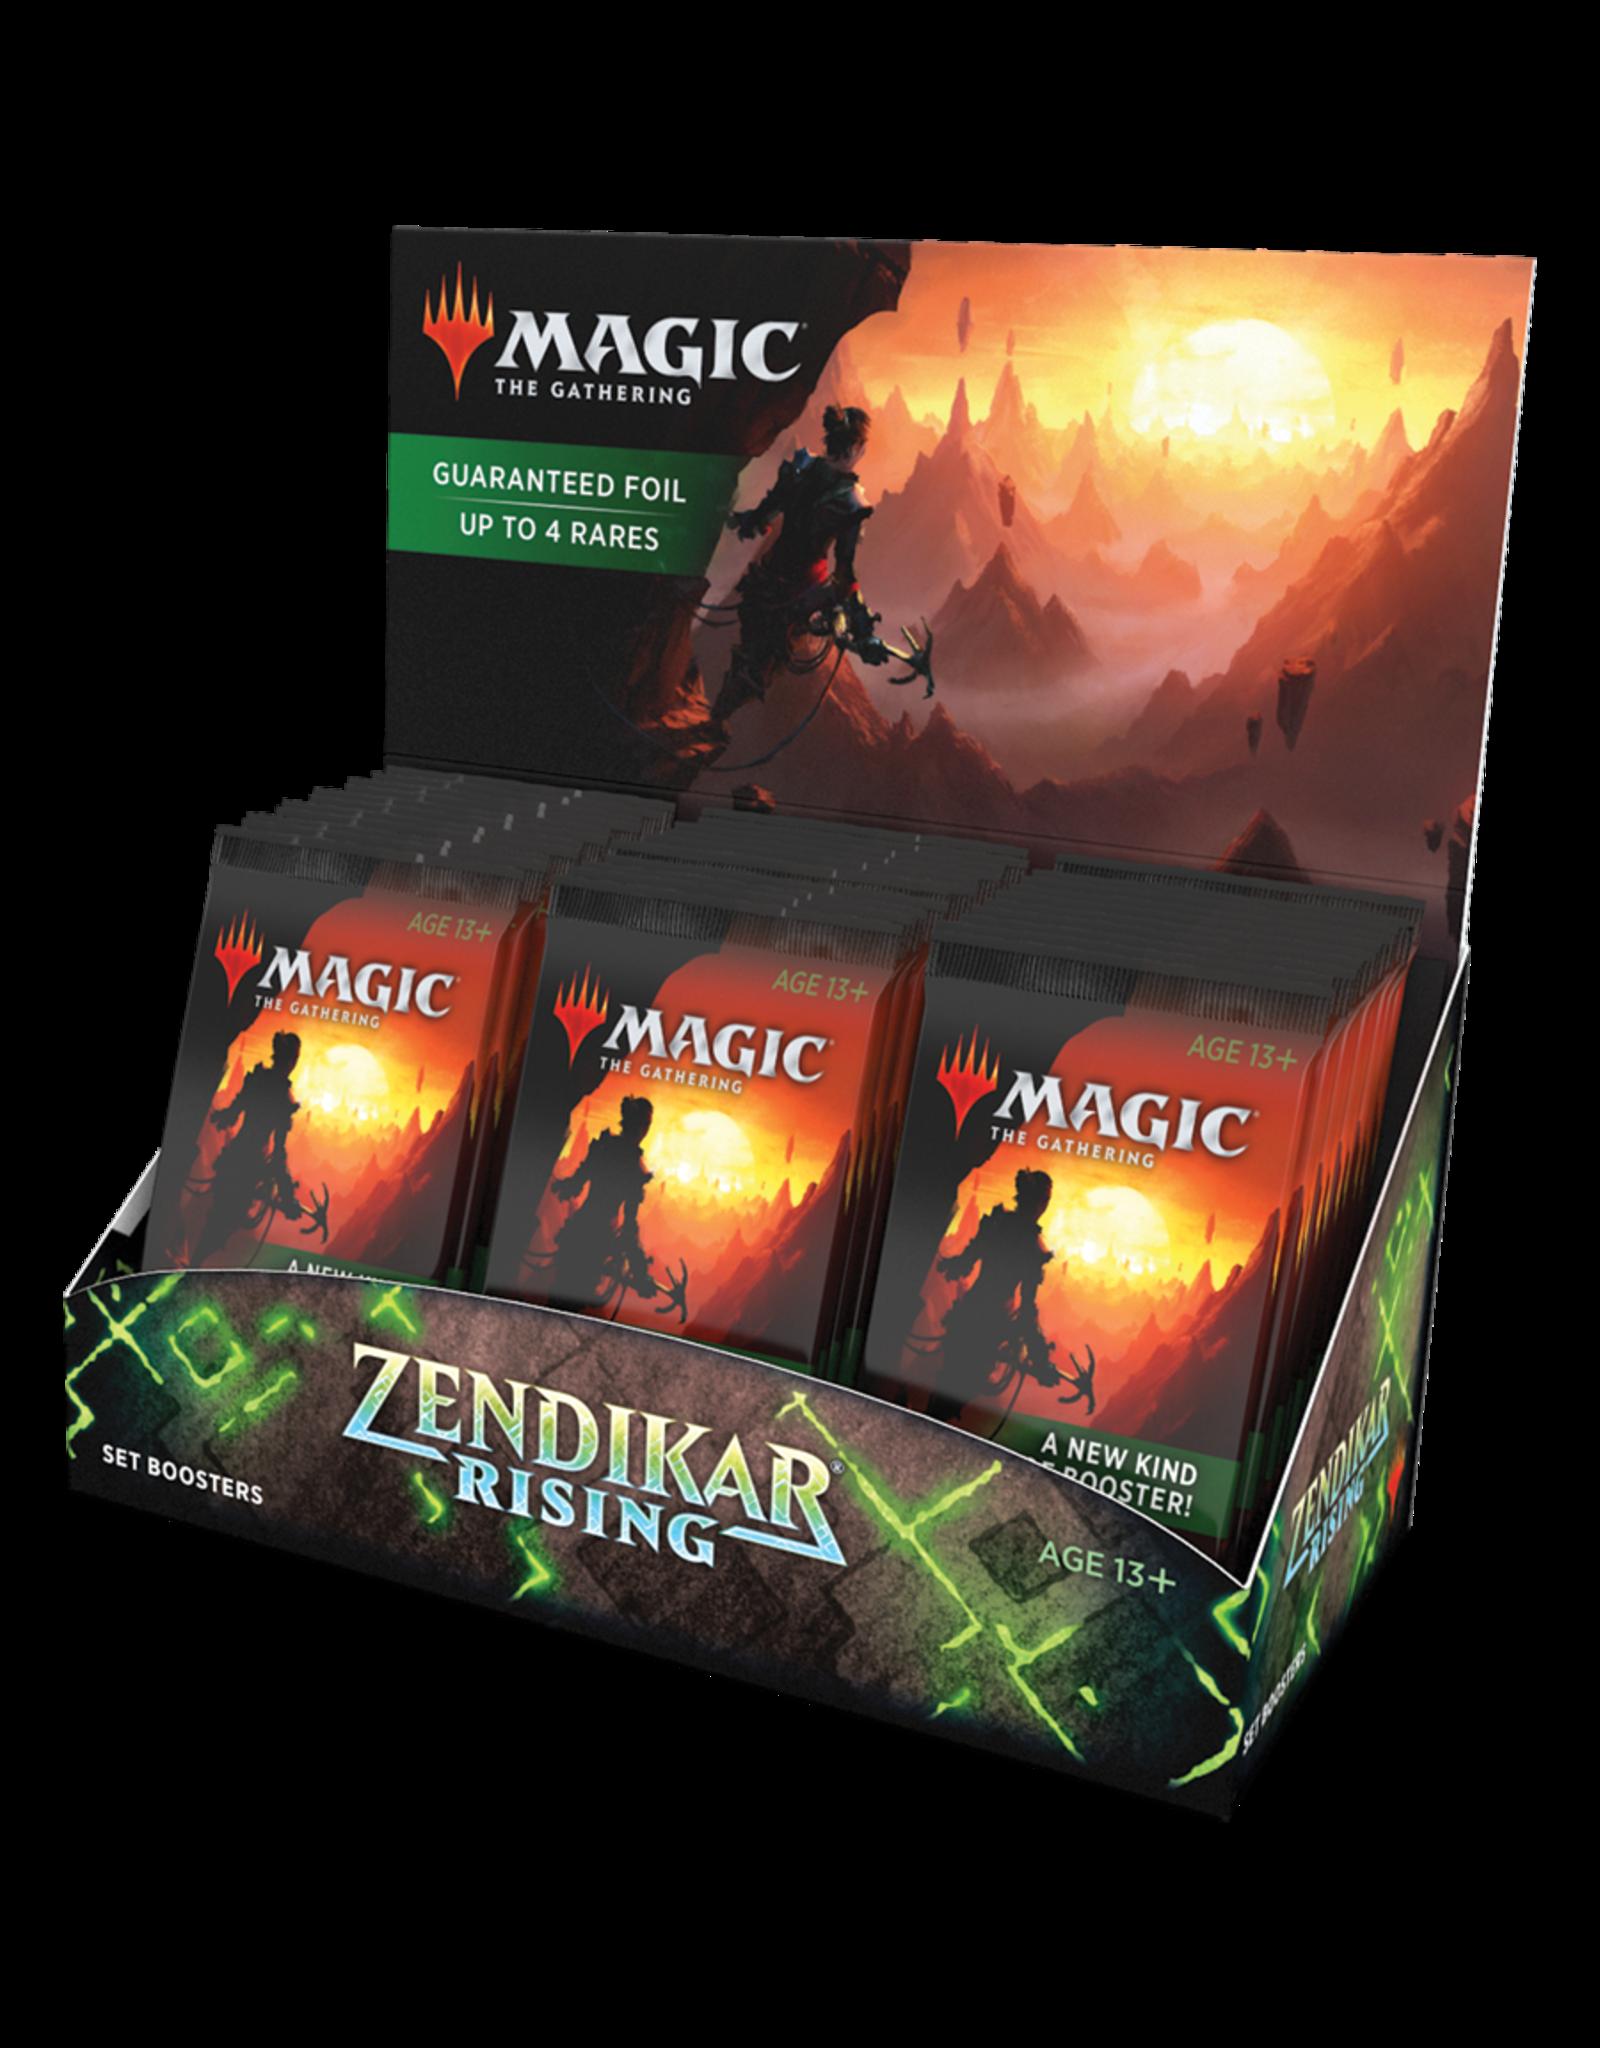 Magic: The Gathering Zendikar Rising Set Booster Box